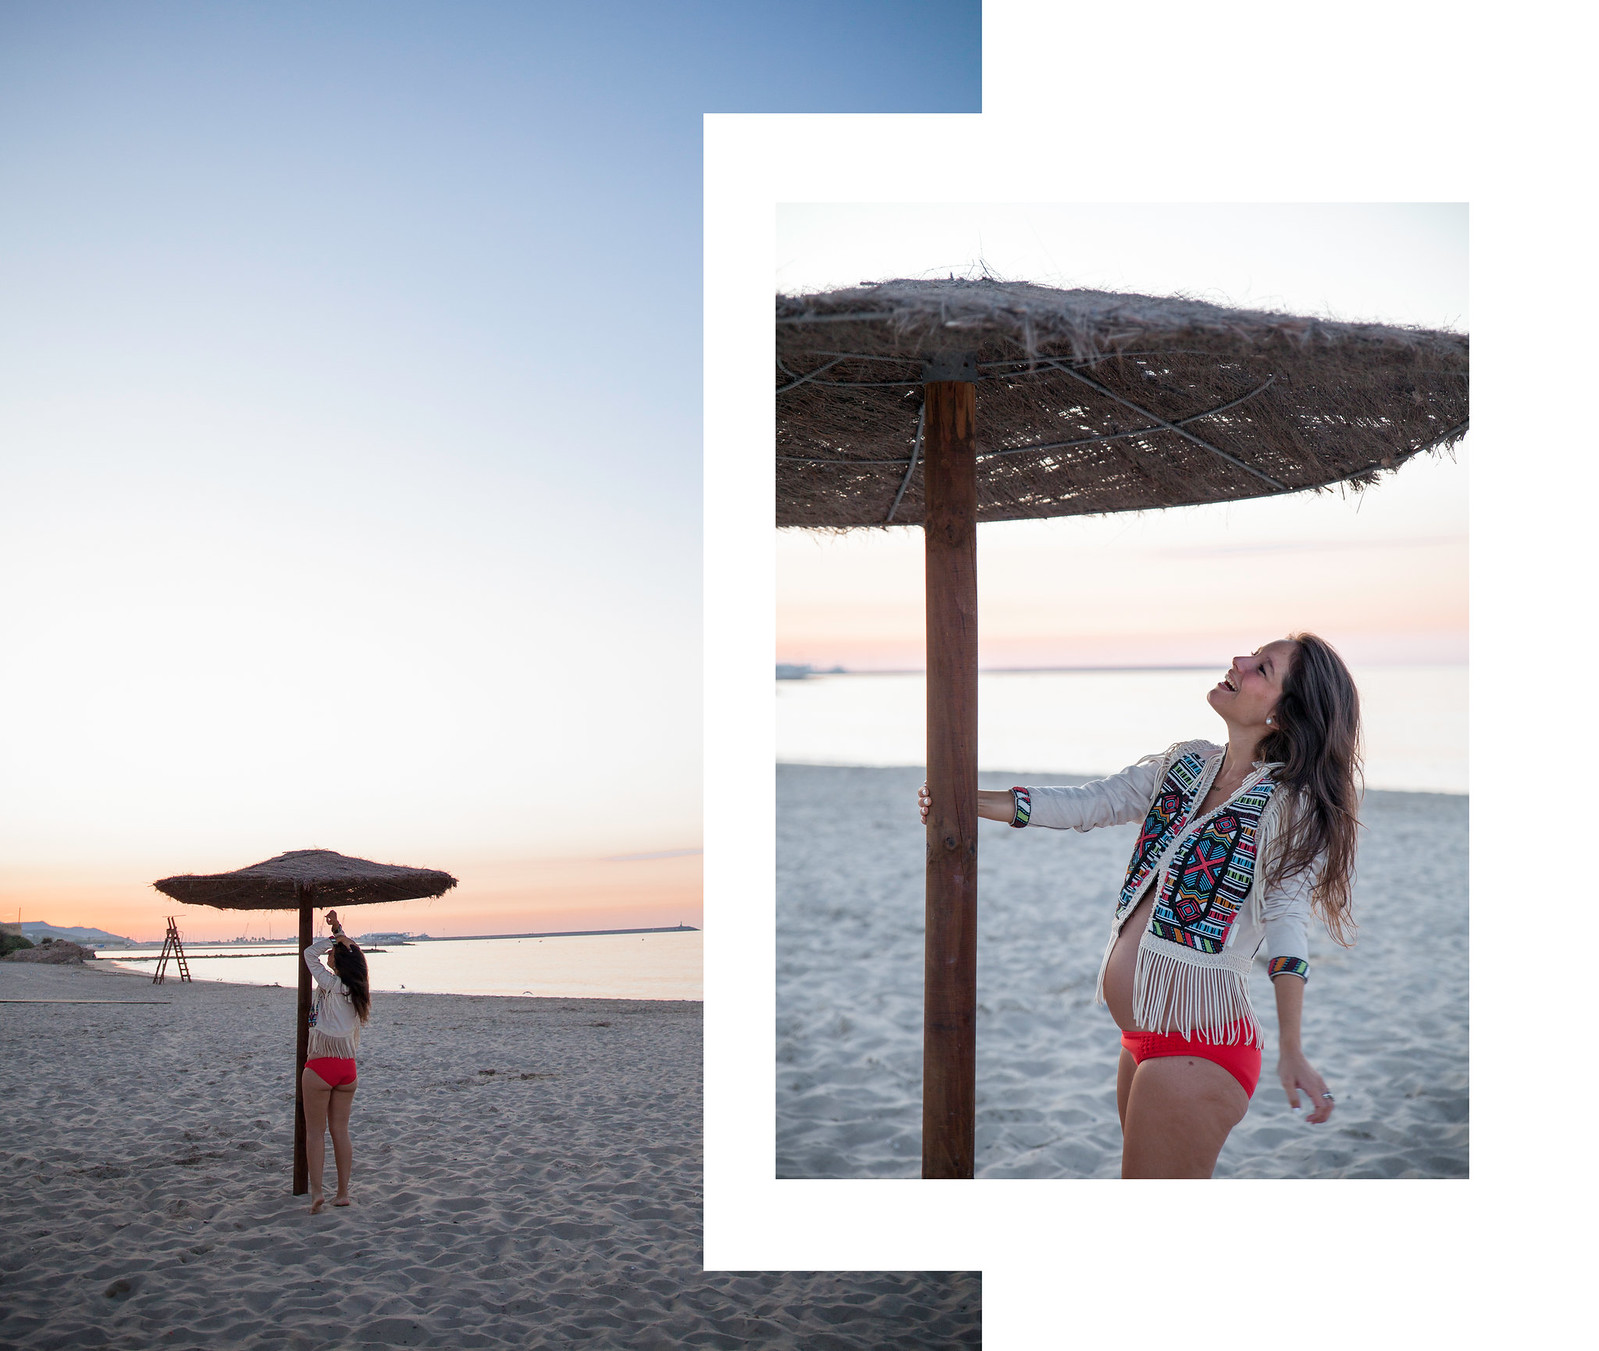 08_chaqueta_ante_felcos_hpreppy_theguestgirl_influencer_barcelona_embarazada_fashion_style